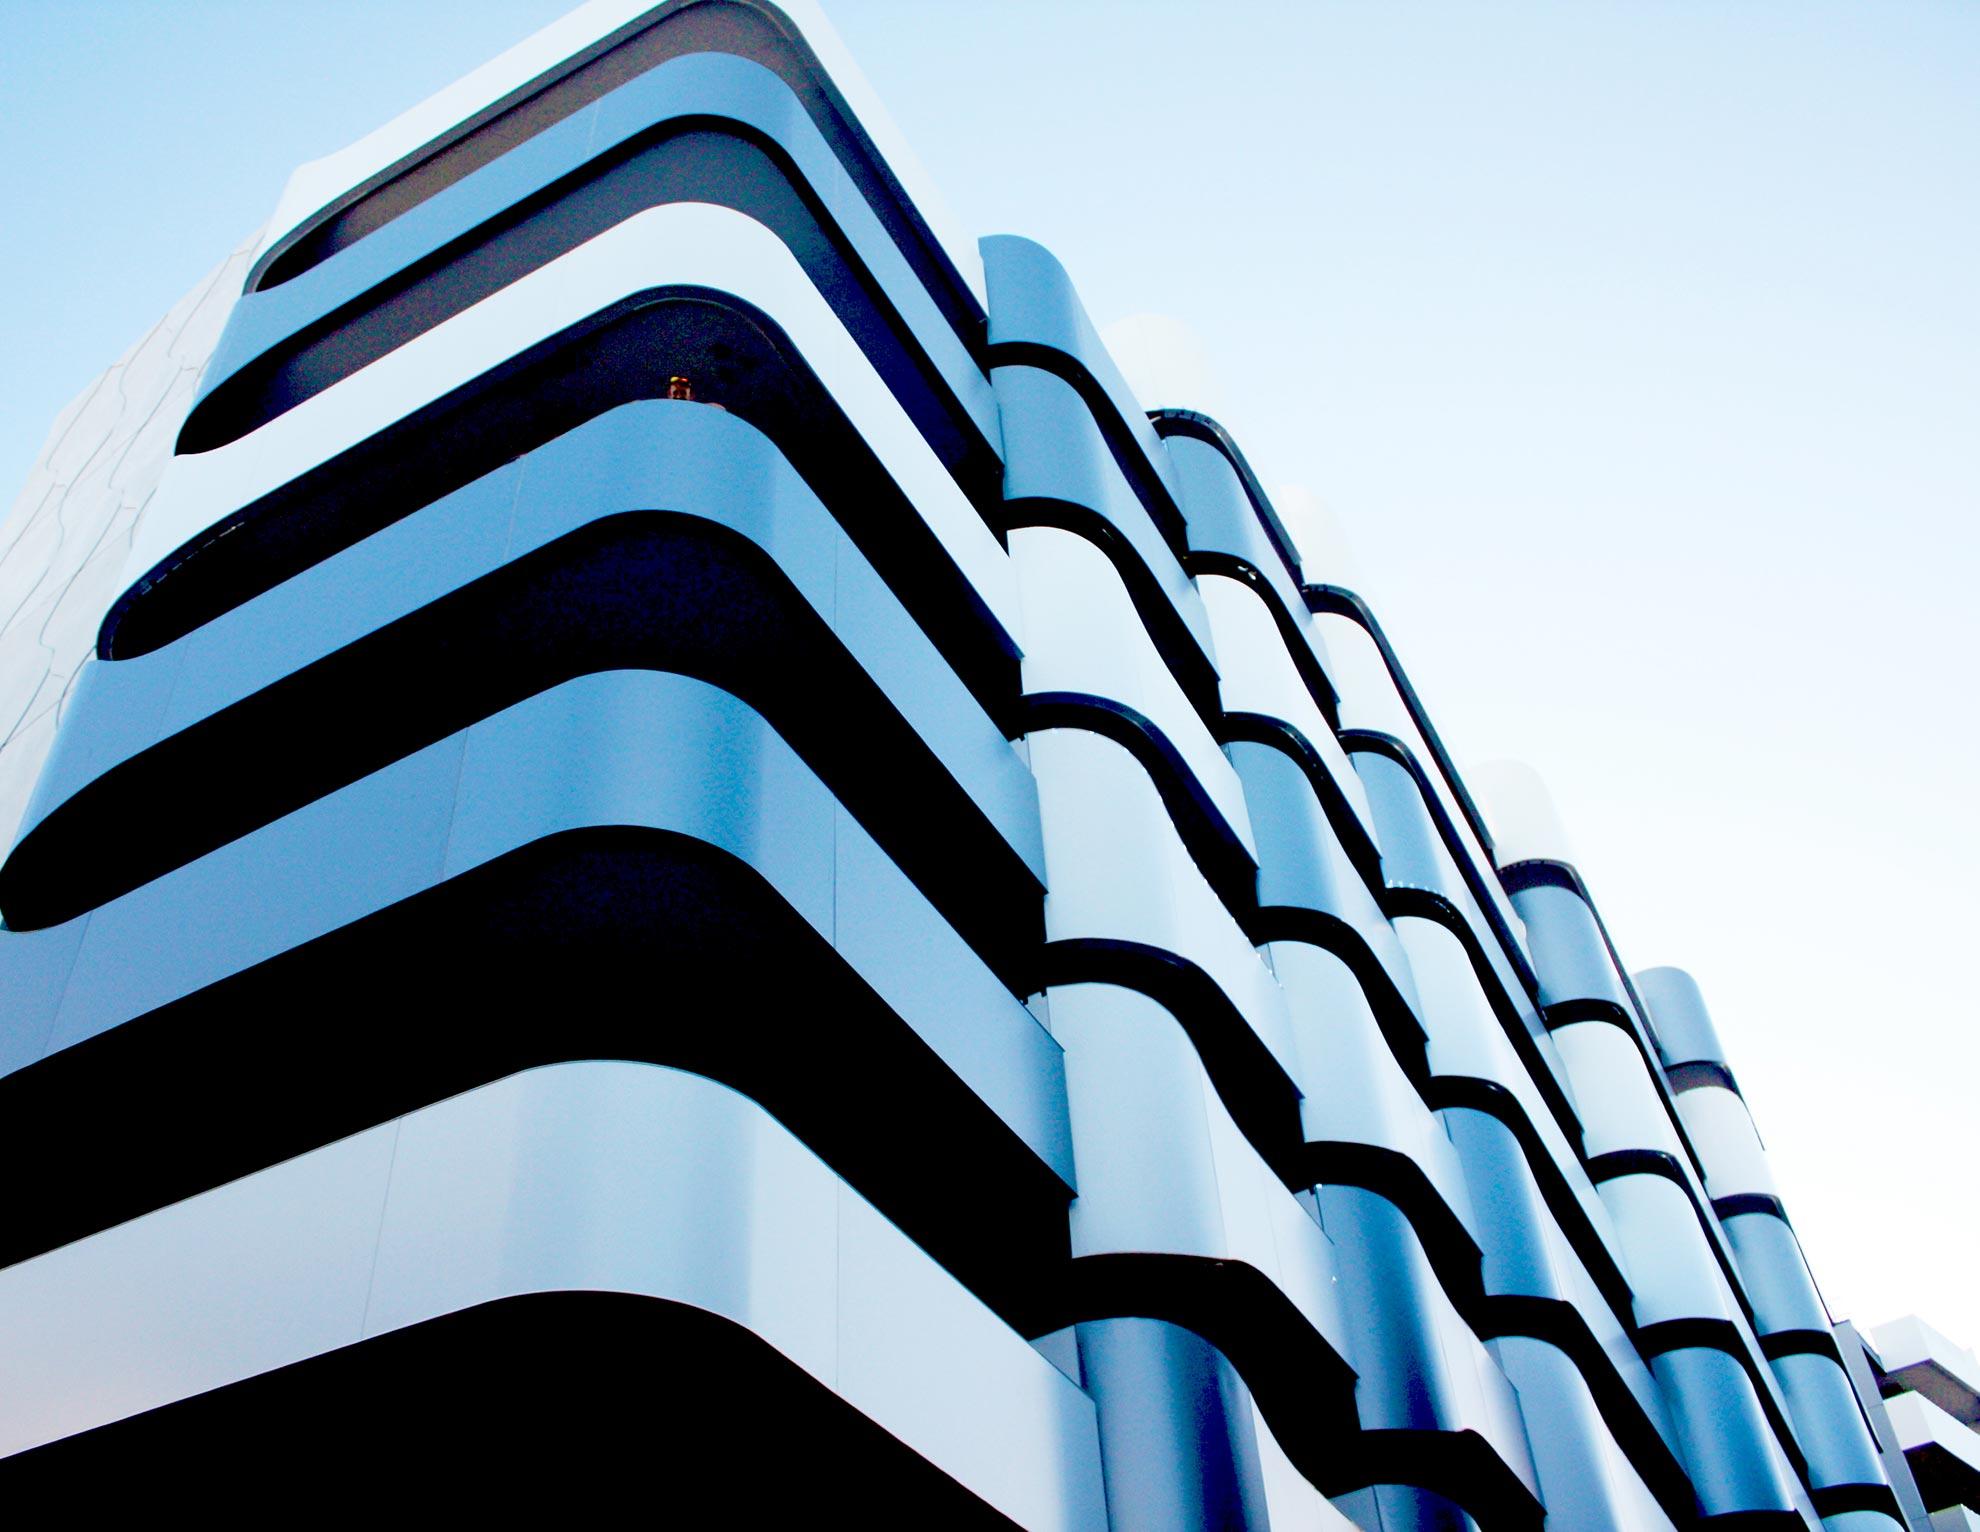 Apartments-Tip-Top-Building.-Australia.-Larcore-A2-White-and-Smoke-Metallic_01_1593602847.jpg